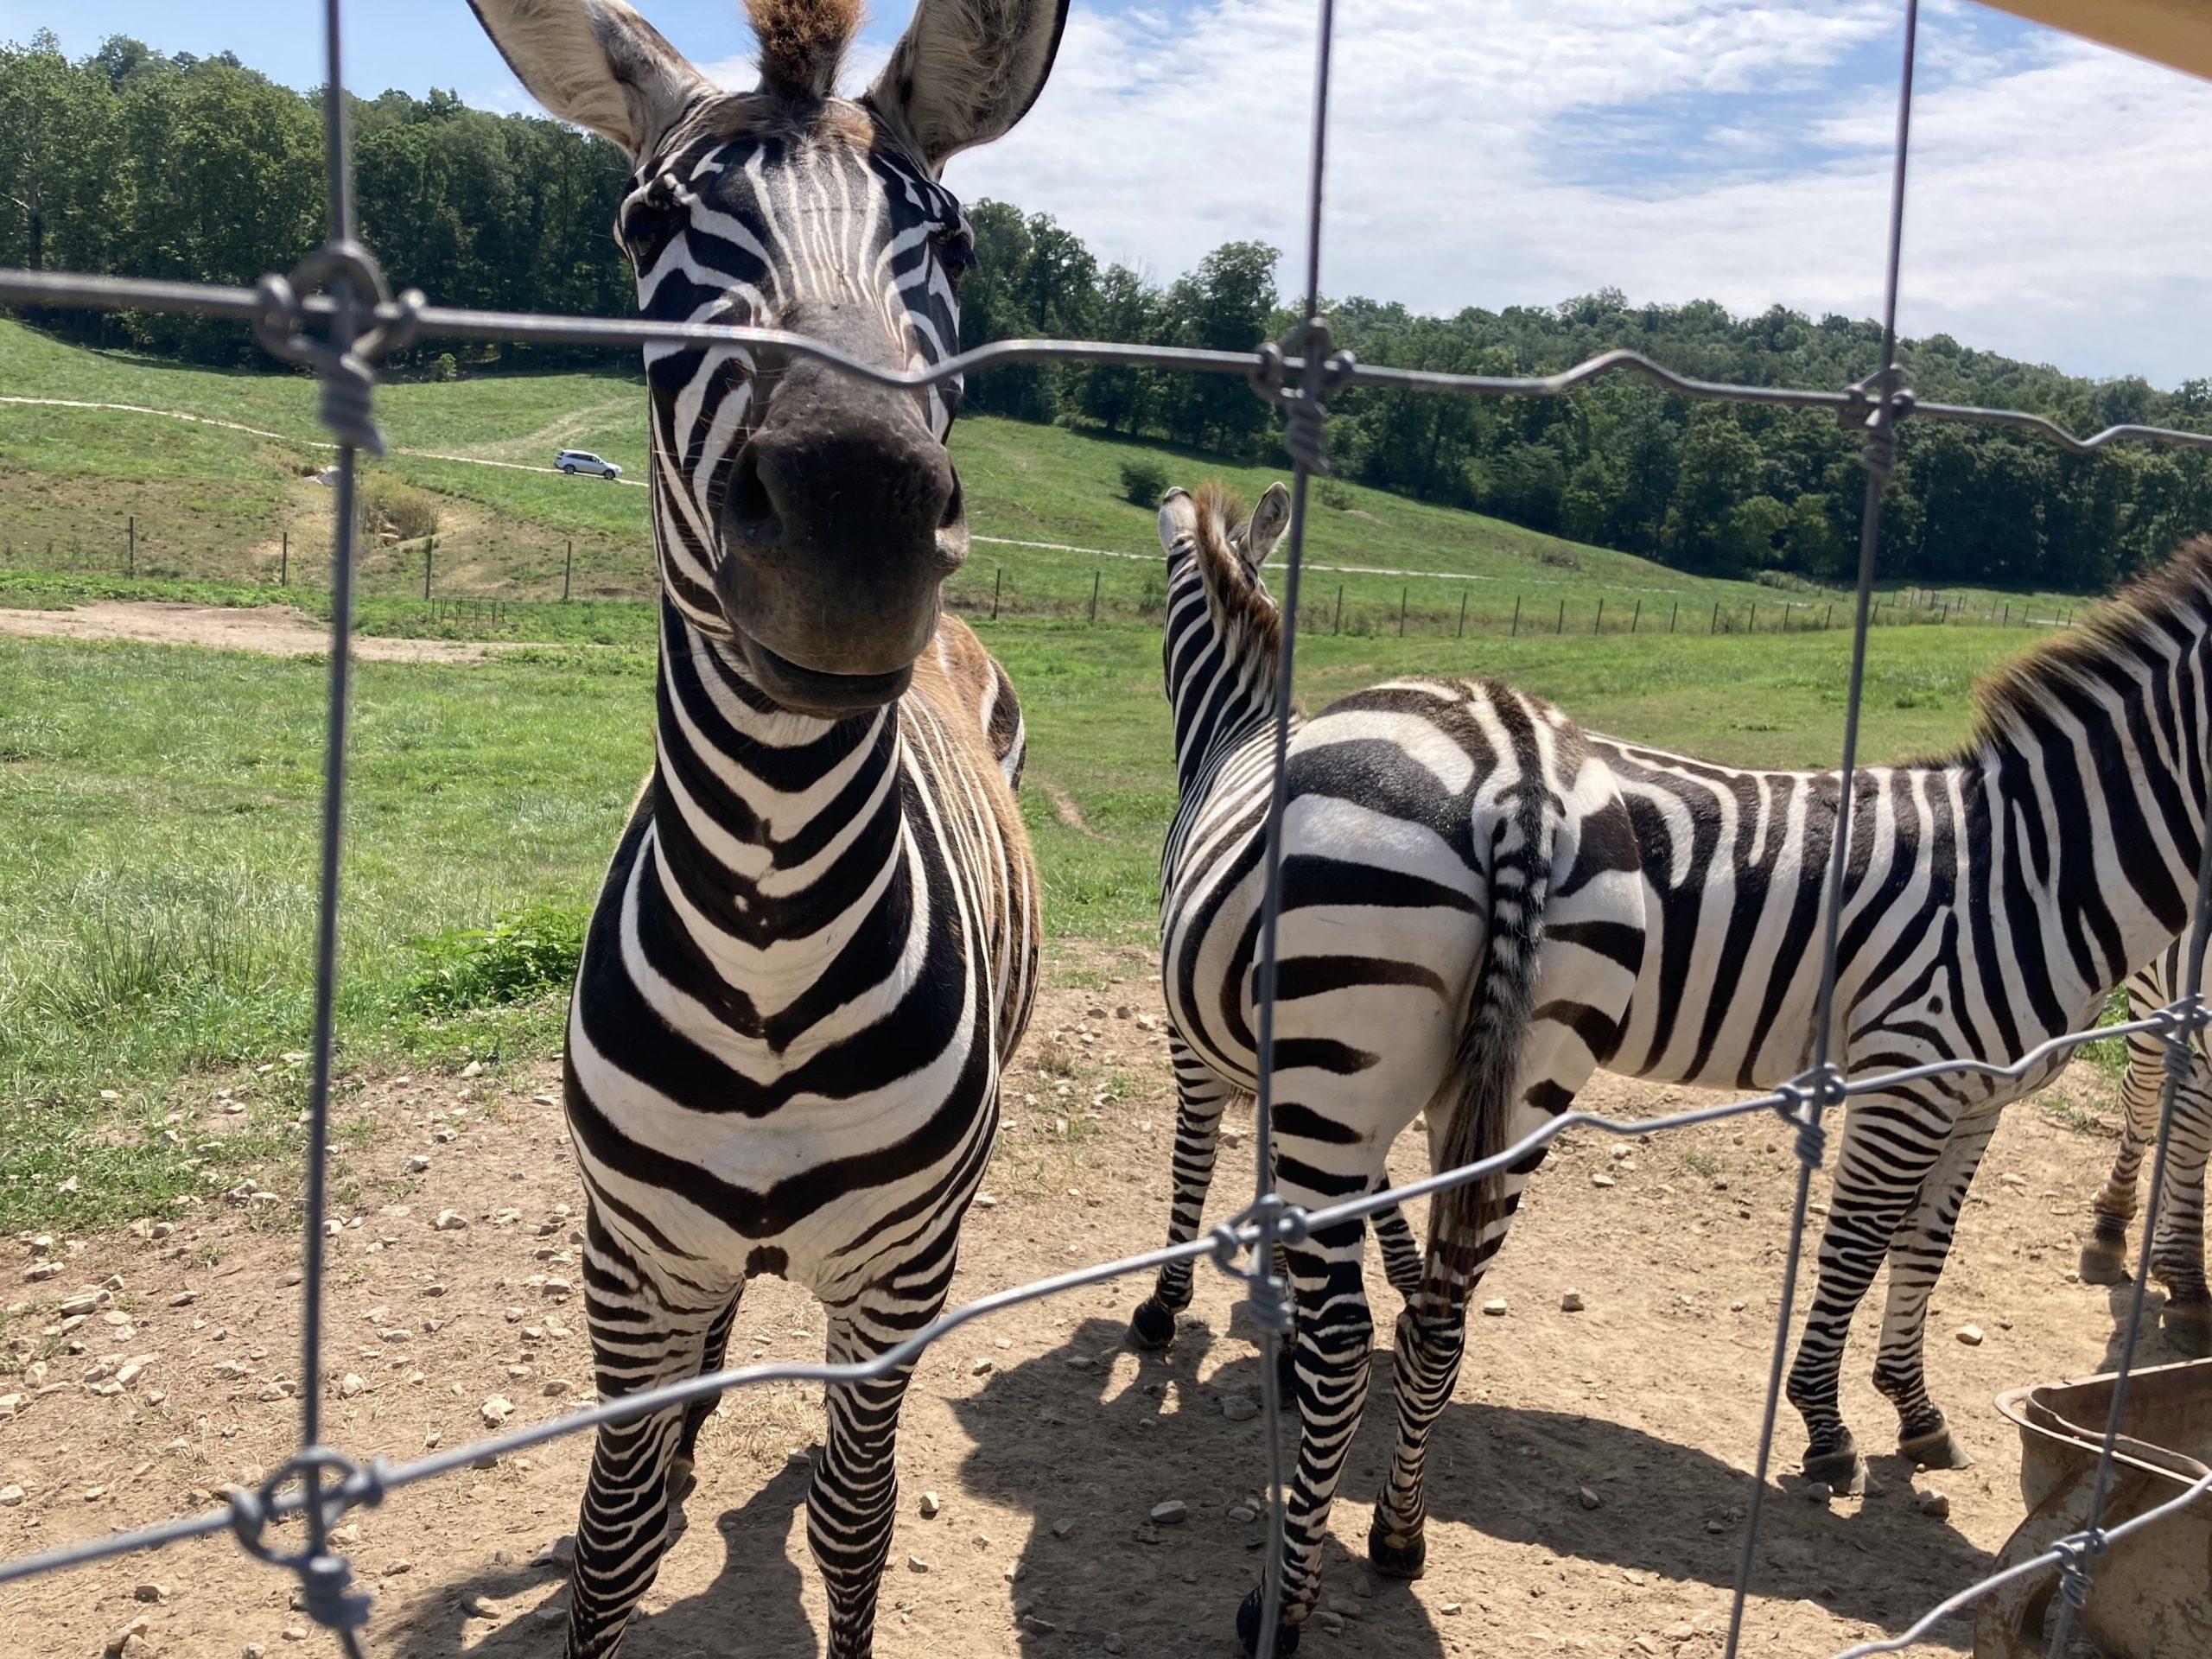 Circle City Adventure Kids - Wilstem Wildlife Drive Thru Park